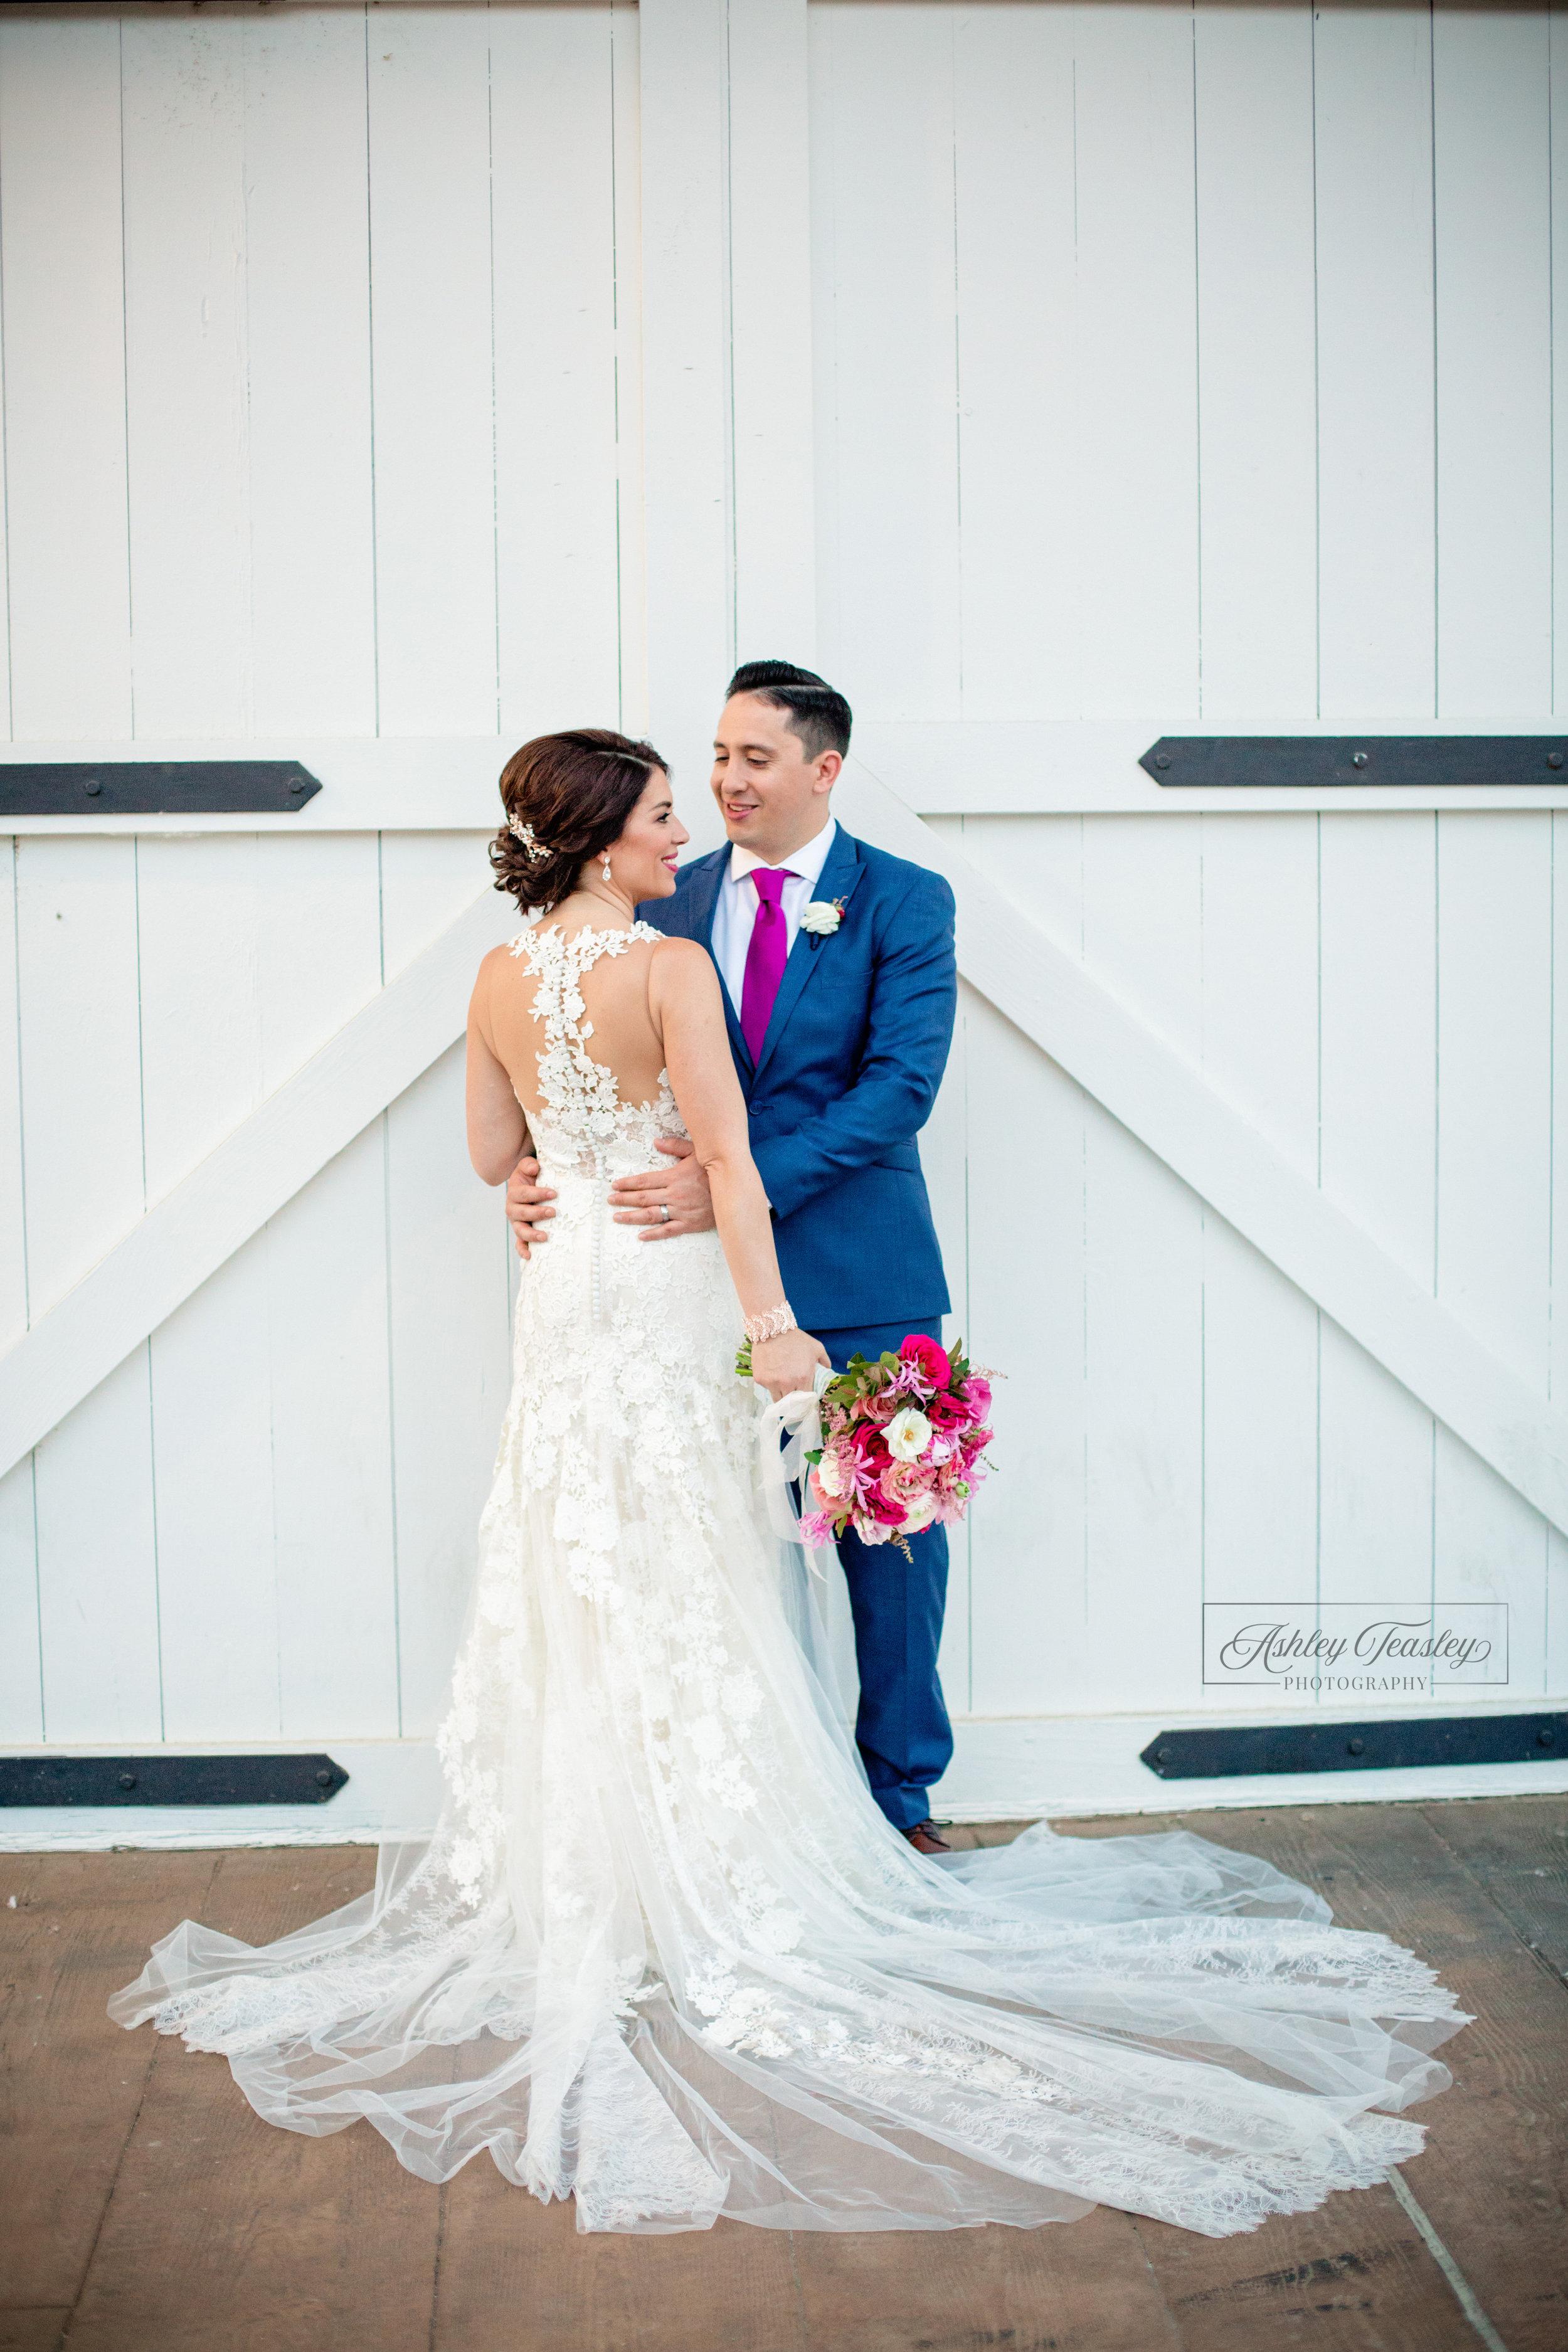 Tarrah & Francisco - The Kimpton Sawyer Hotel - The Firehouse Old Sac - Sacramento Wedding Photographer - Ashley Teasley Photography (102 of 118).jpg